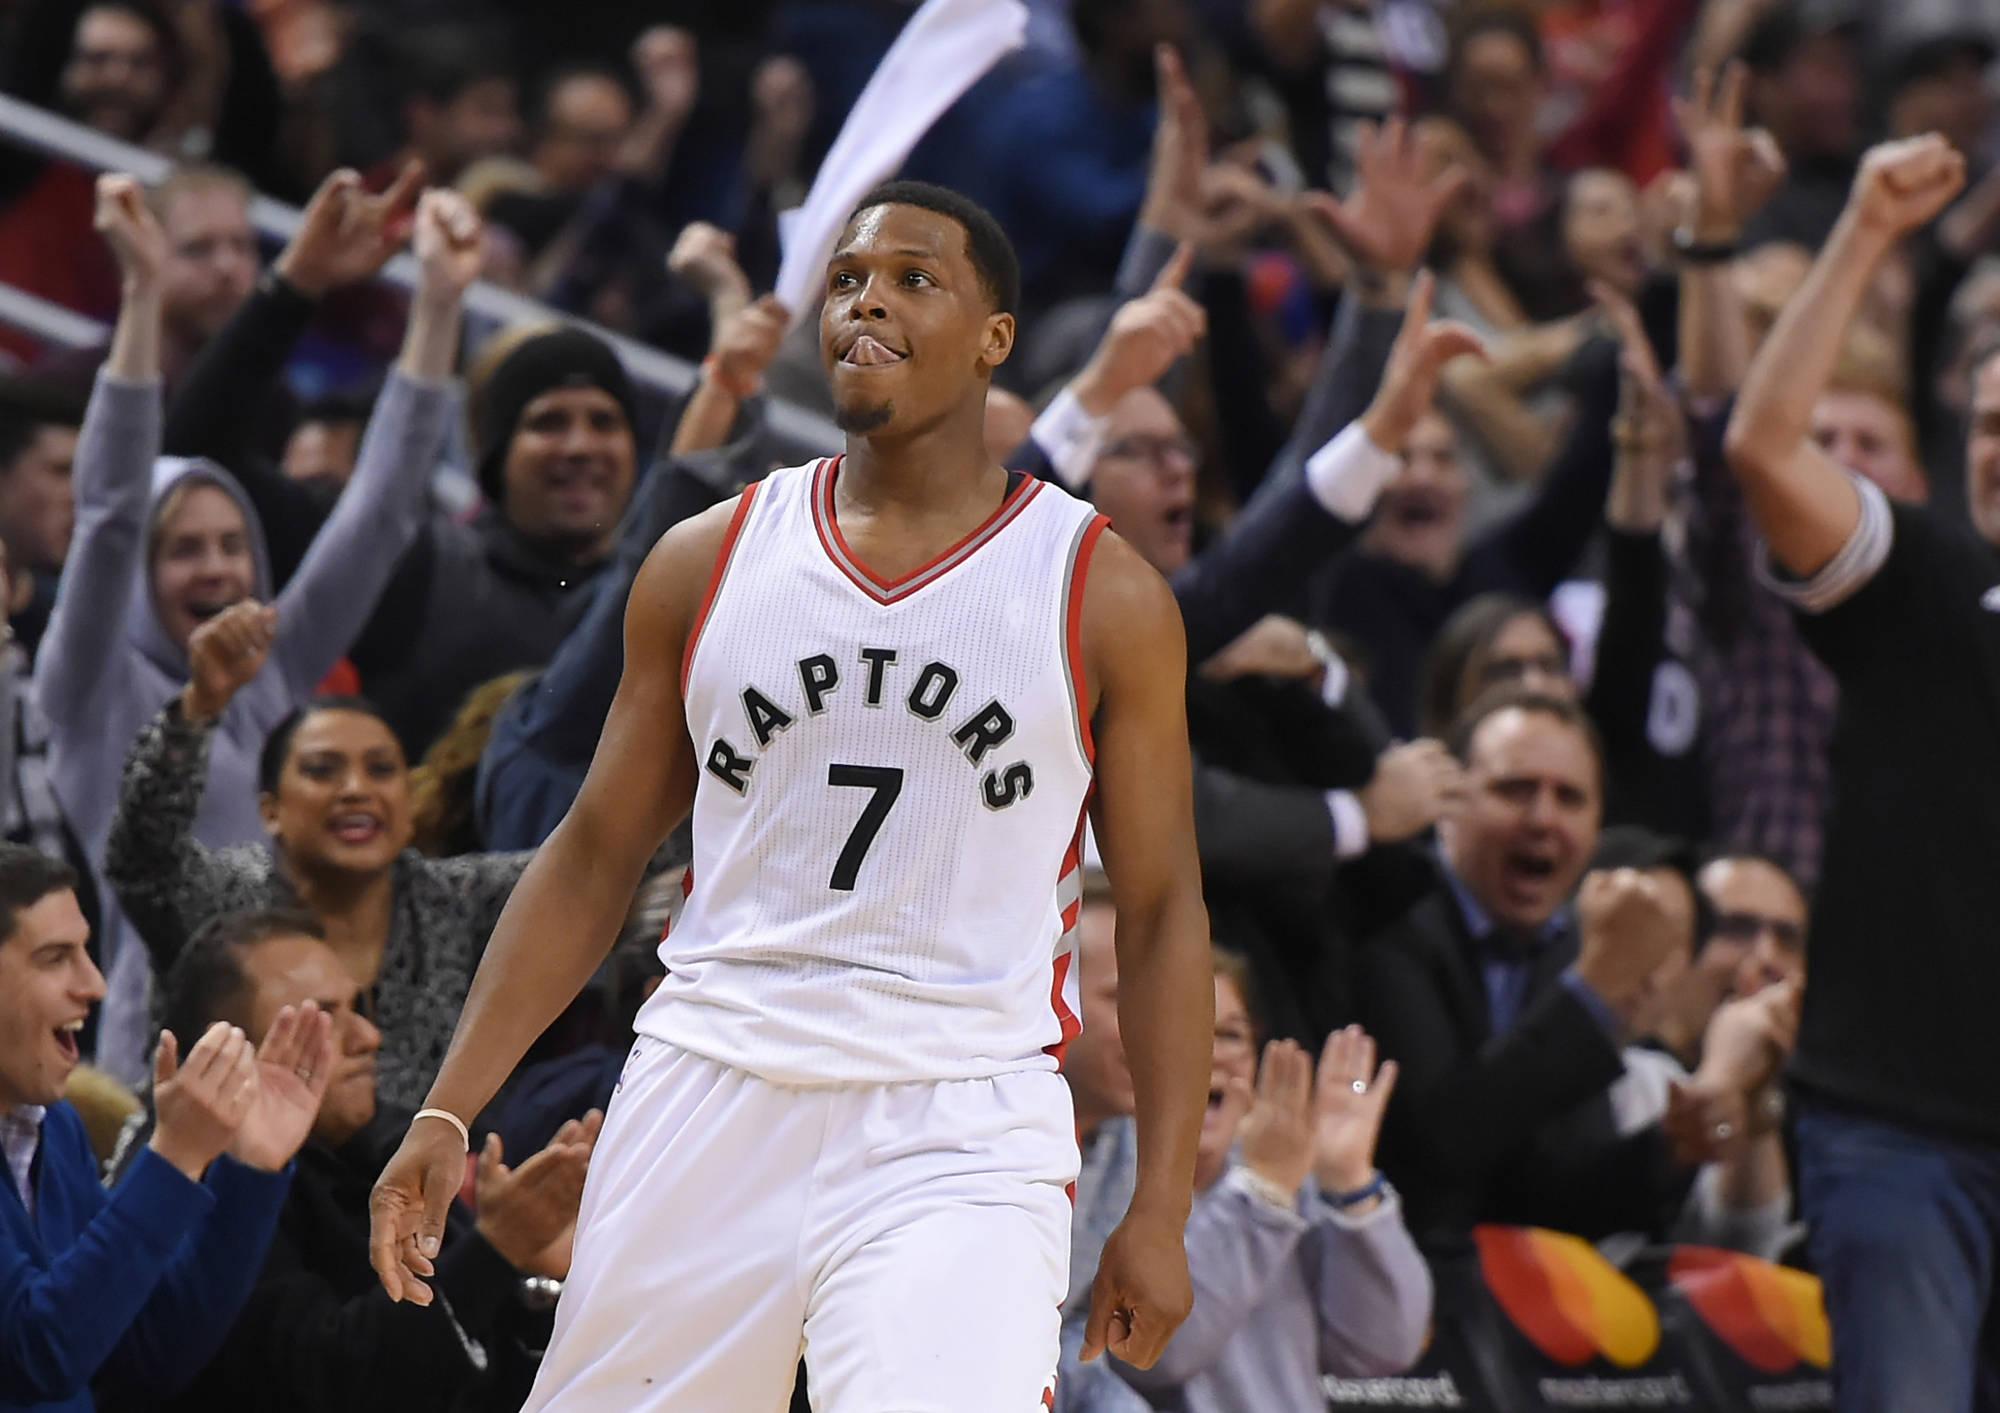 The Toronto Raptors beat the Utah Jazz in tough game